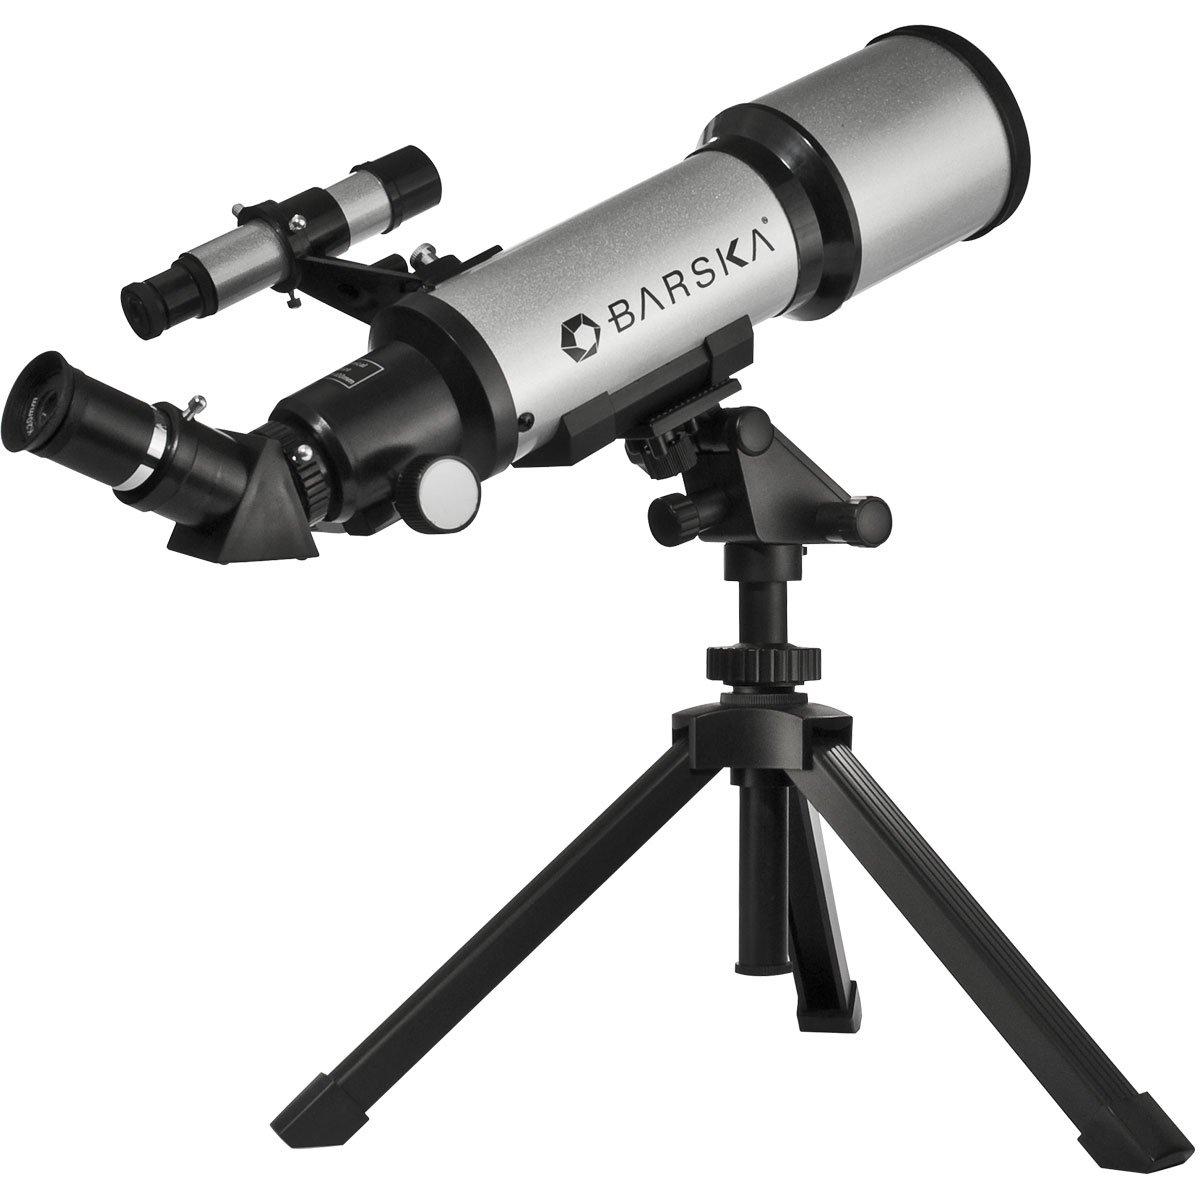 BARSKA Starwatcher 400x70mm Refractor Telescope w/ Tabletop Tripod & Carry Case by BARSKA